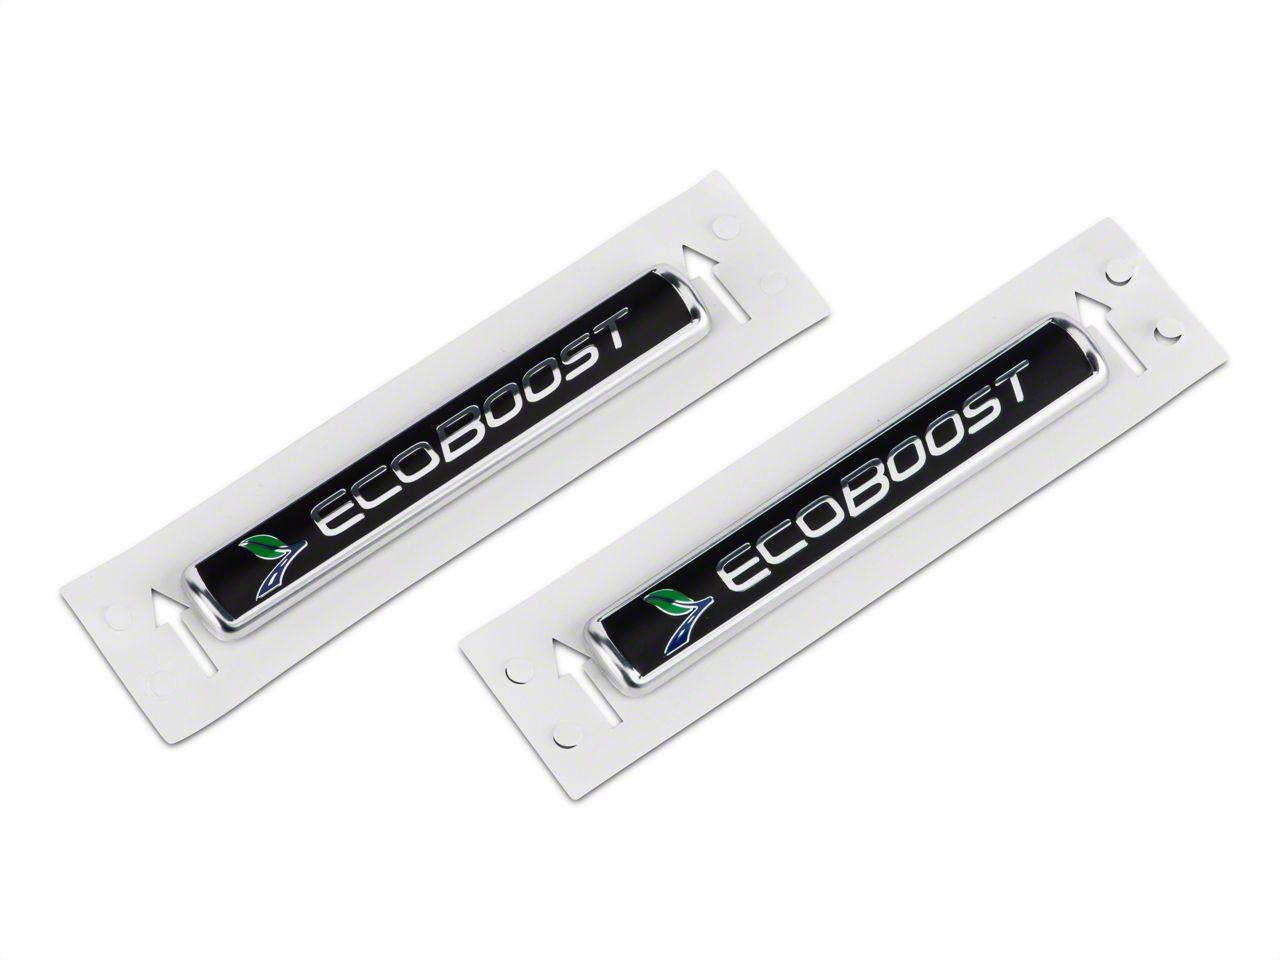 Ford Performance EcoBoost Emblem - Black (11-19 2.7L/3.5L EcoBoost F-150)